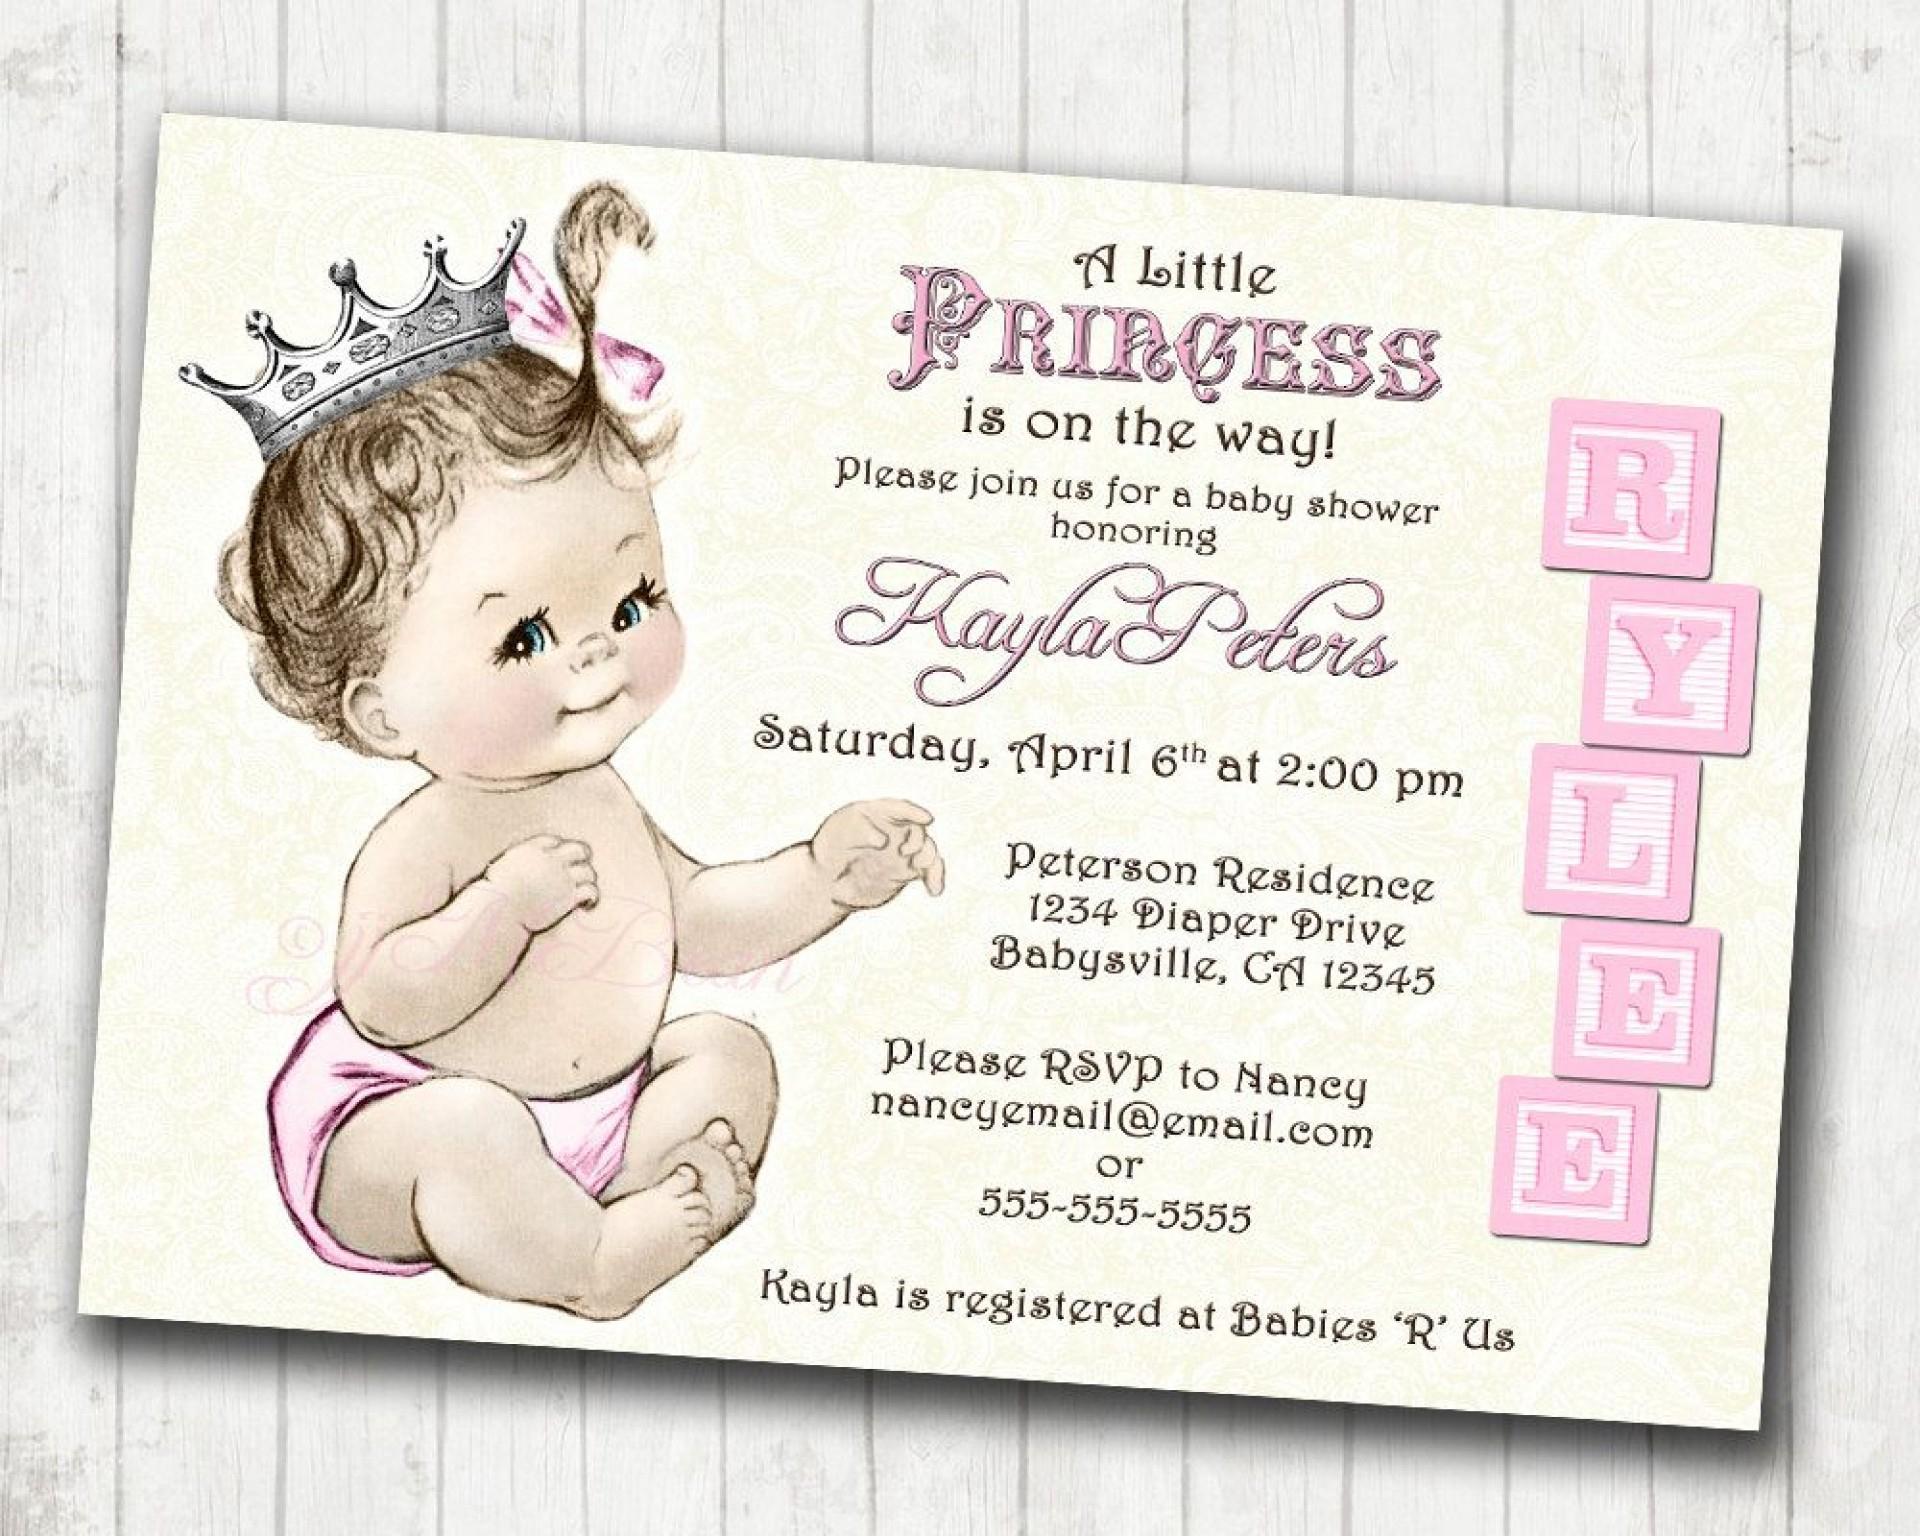 Astounding Princess Baby Shower Invitations Templates ~ Ulyssesroom - Free Printable Princess Baby Shower Invitations